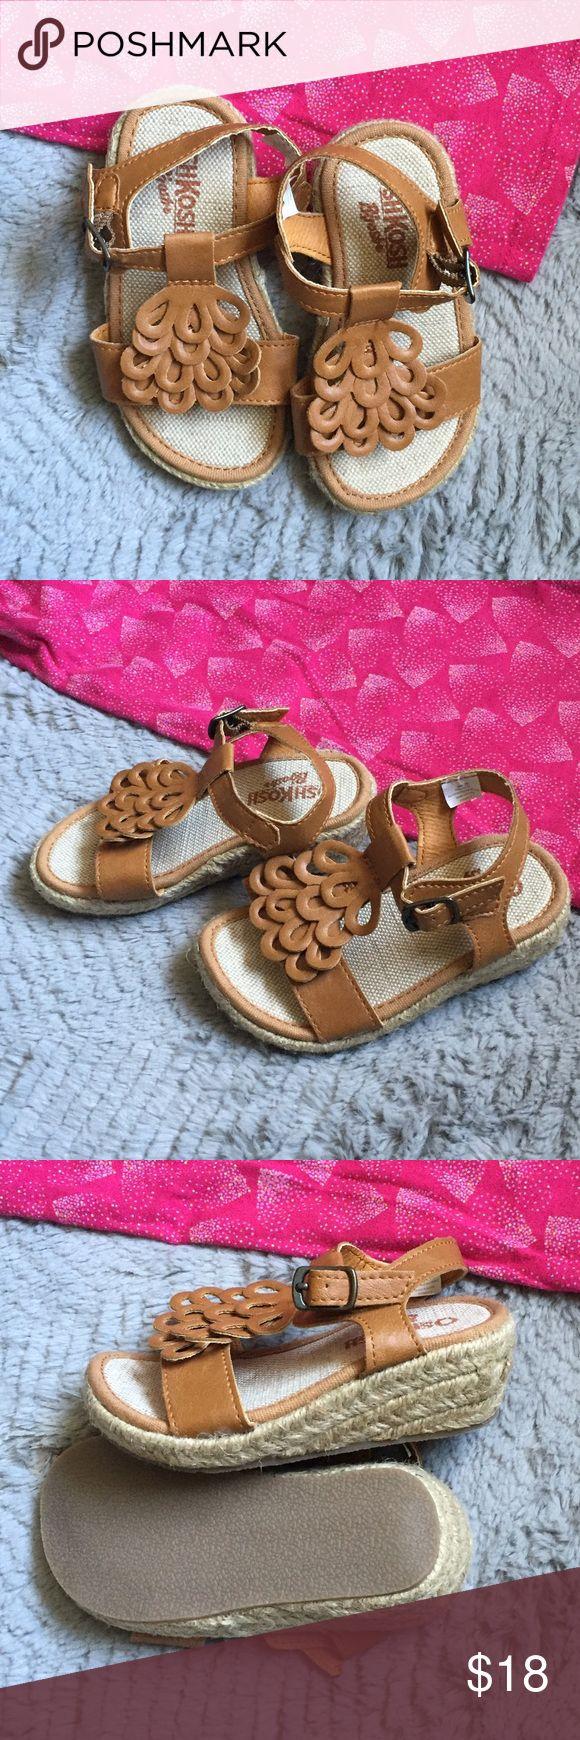 NWOT Osh Kosh Espadrilles Brand new Osh Kosh Espadrilles shoes Osh Kosh Shoes Sandals & Flip Flops